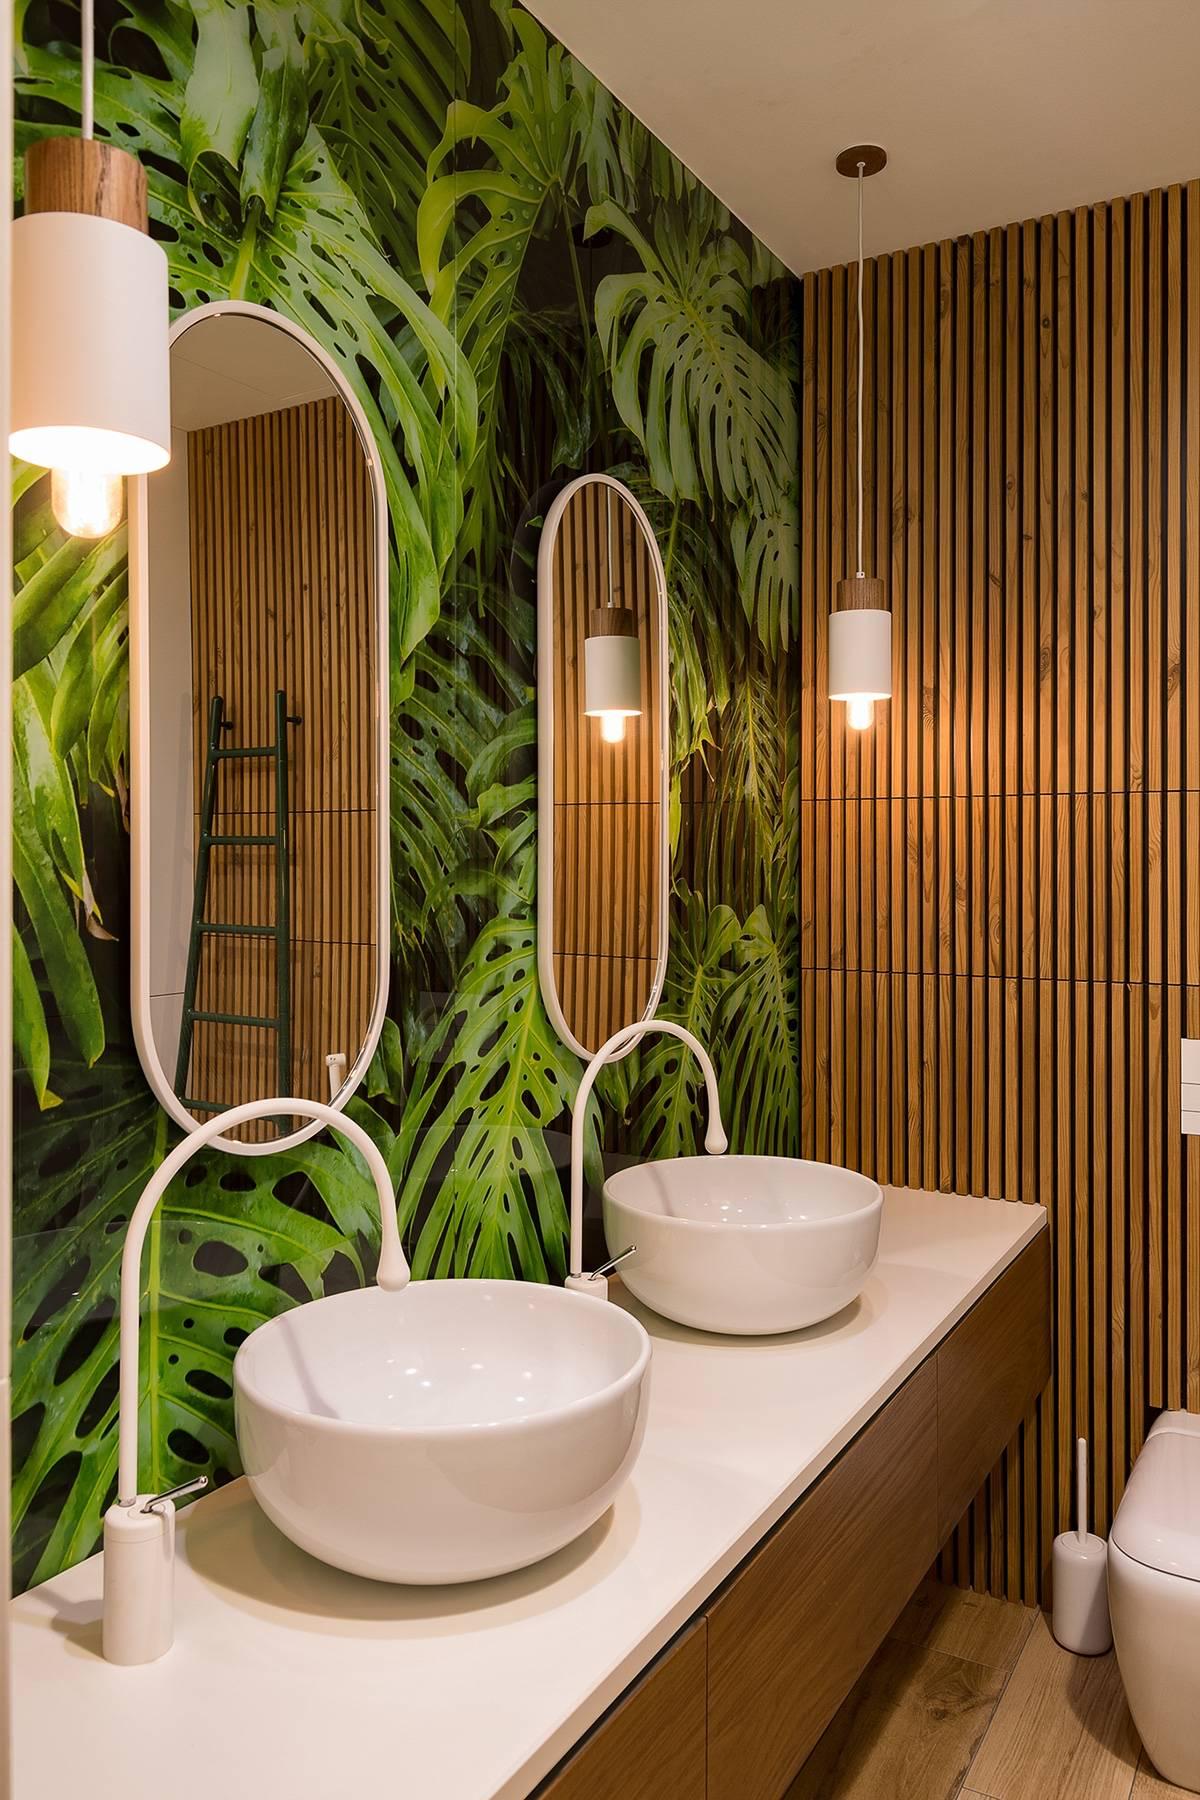 Bathroom-Counters-Sinks